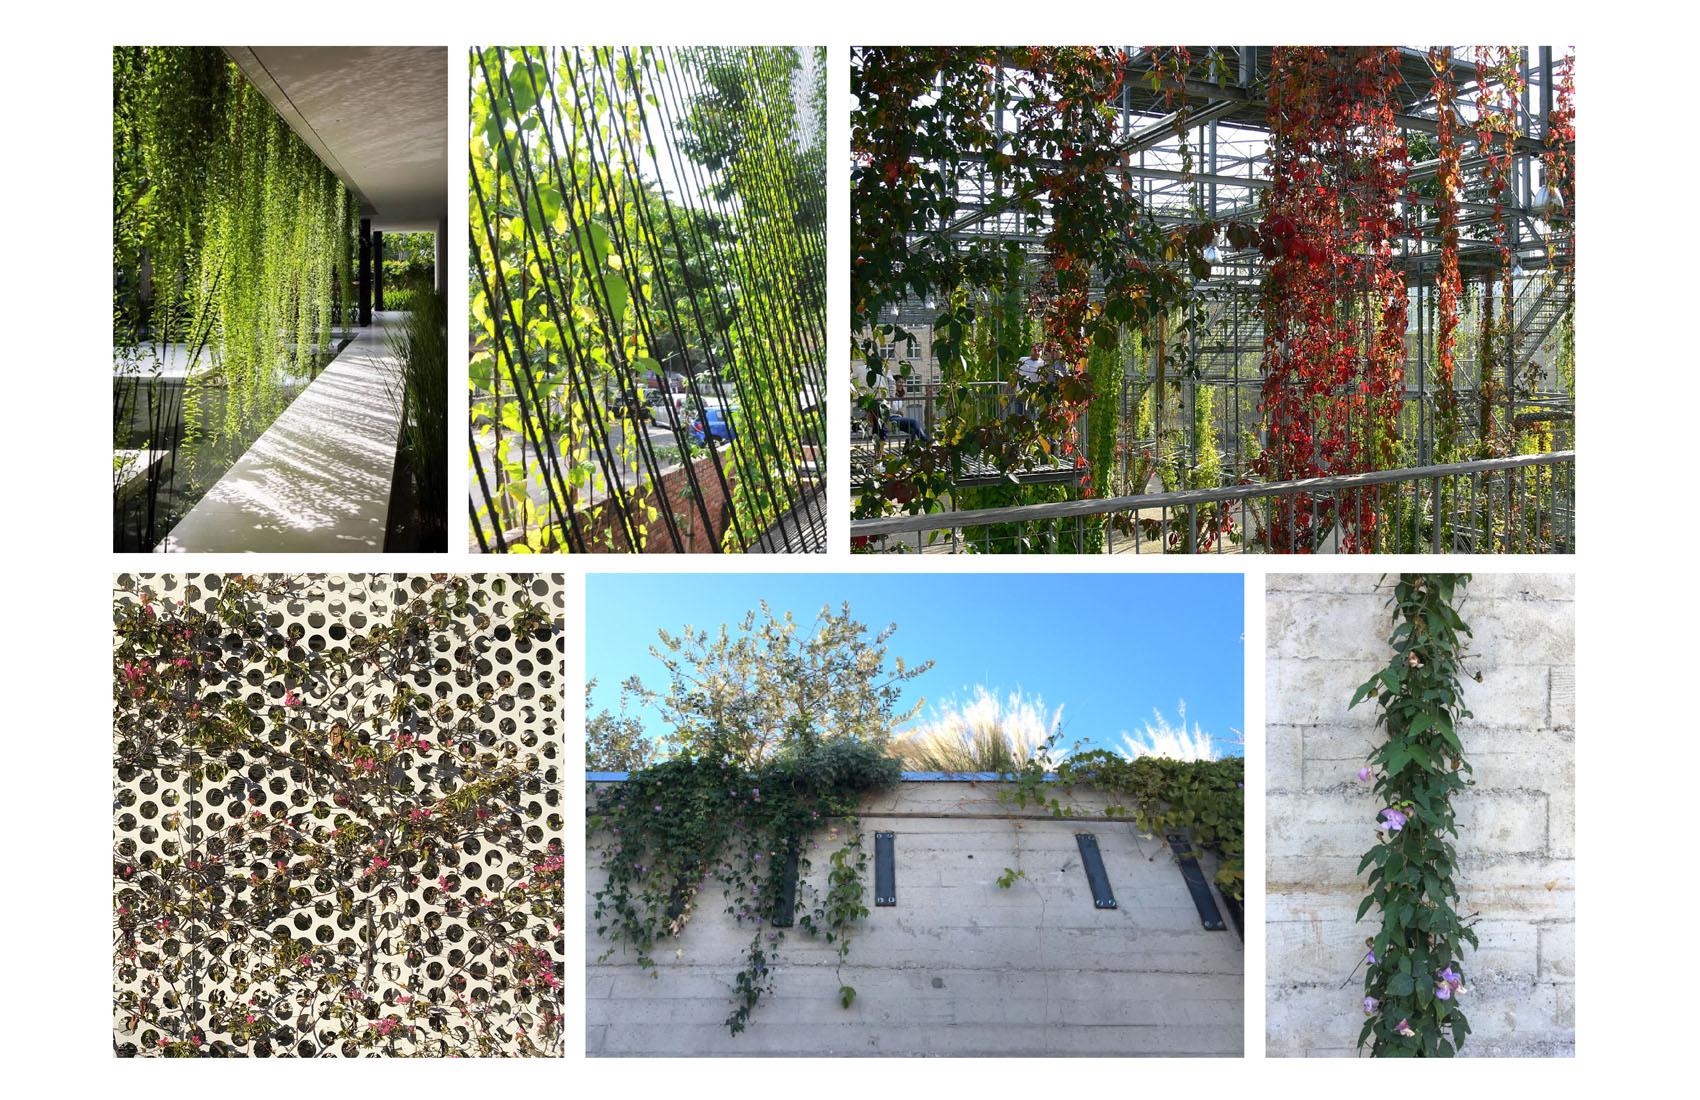 TINA CHEE landscape studio-ref images 2.jpg